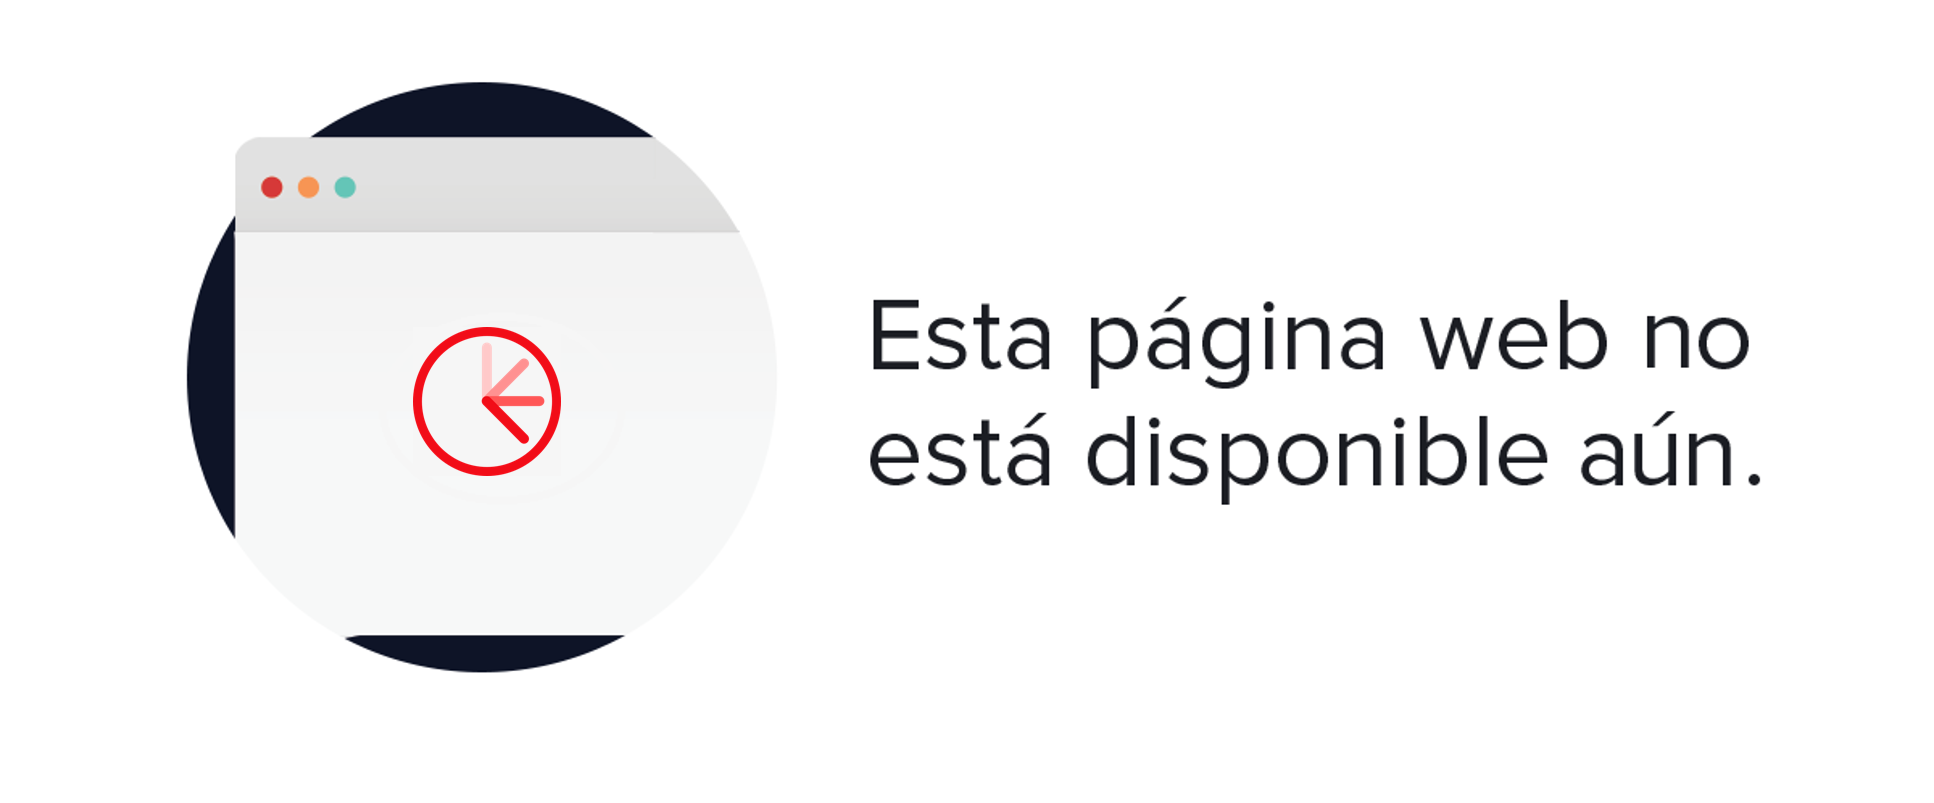 Bolsas de Papel Personalizadas con Asa Rizada Medidas 36+12x41 cm 110gr